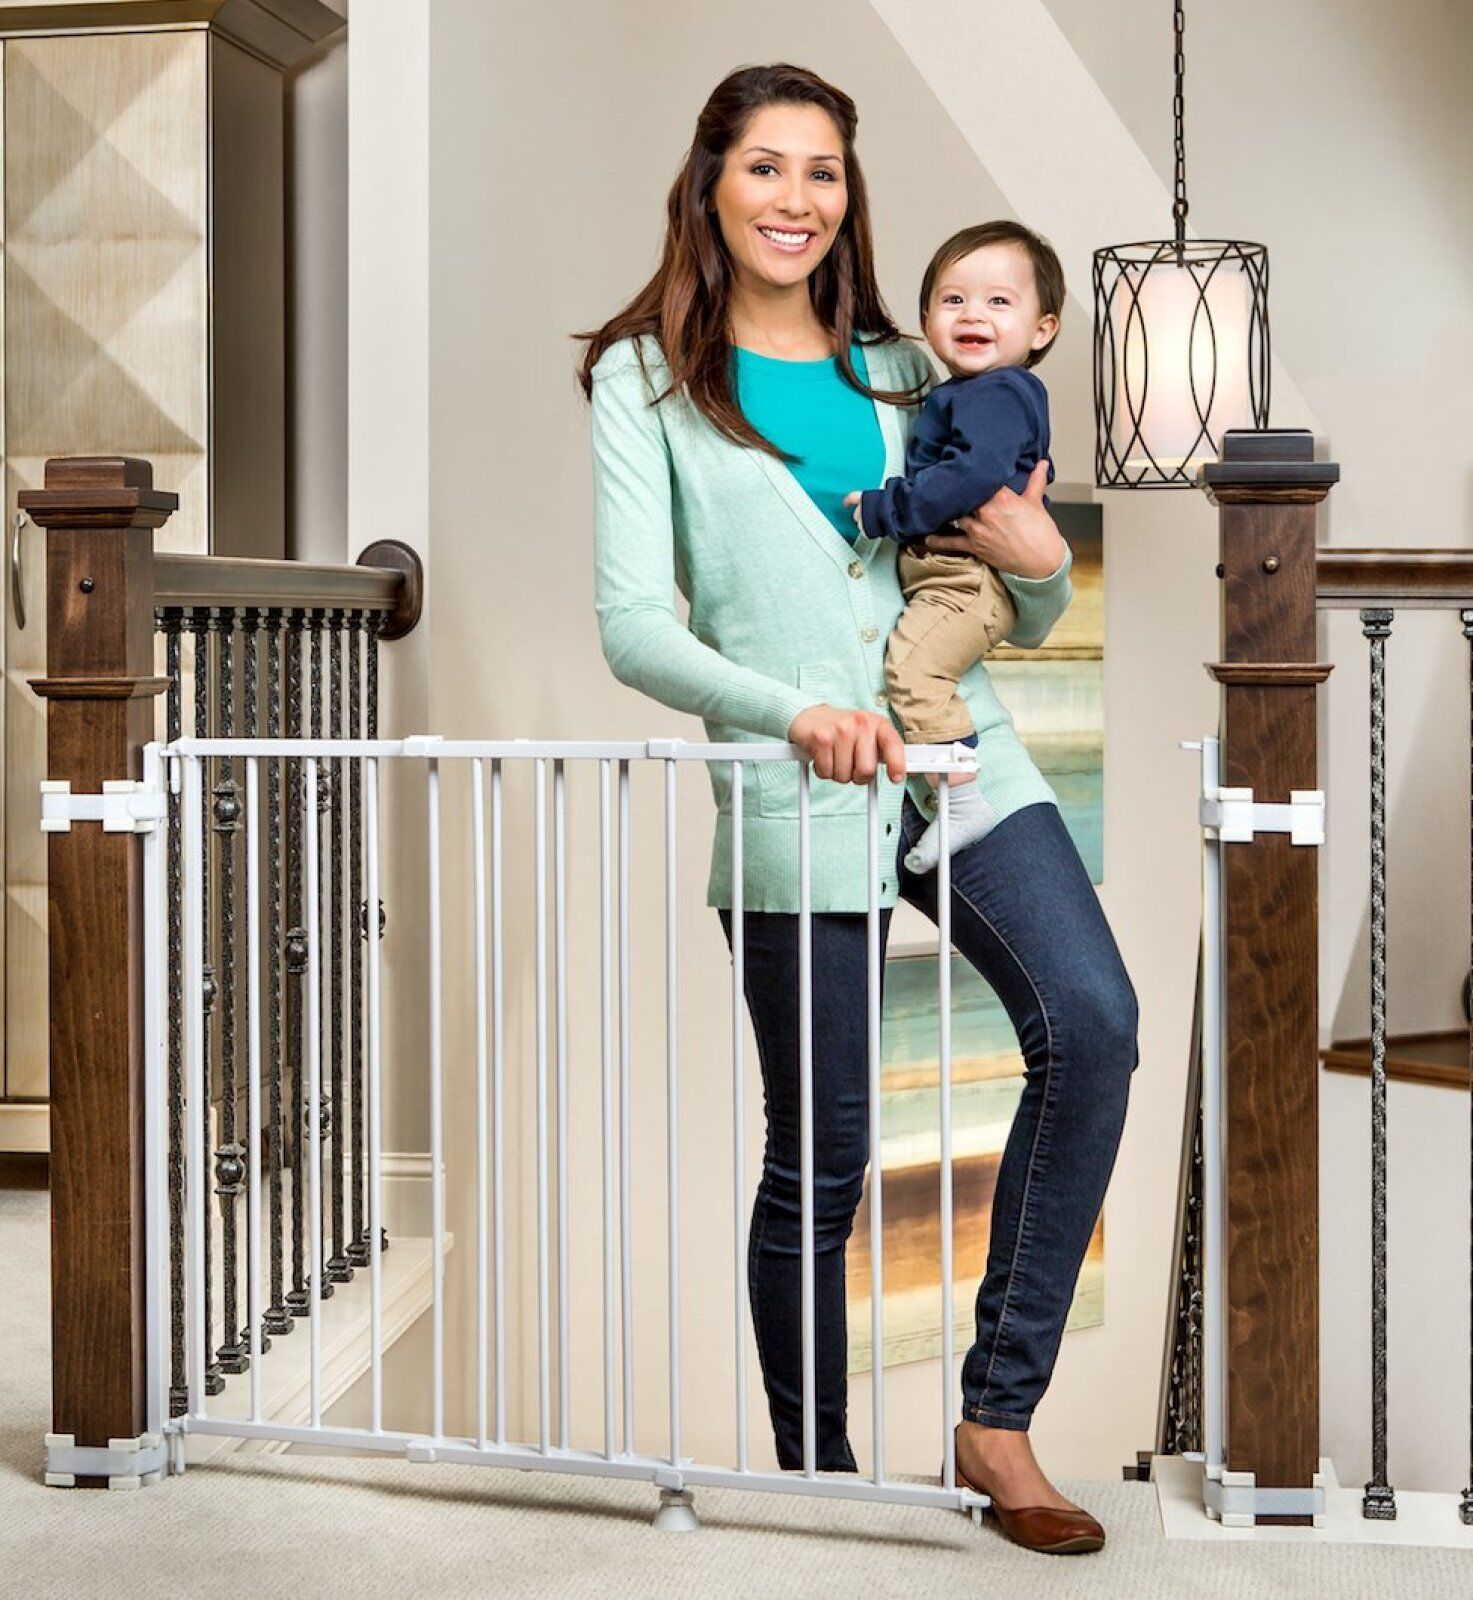 Baby Safety Gate Child Enclosure Walk Thru Pet Dog Cat Swing